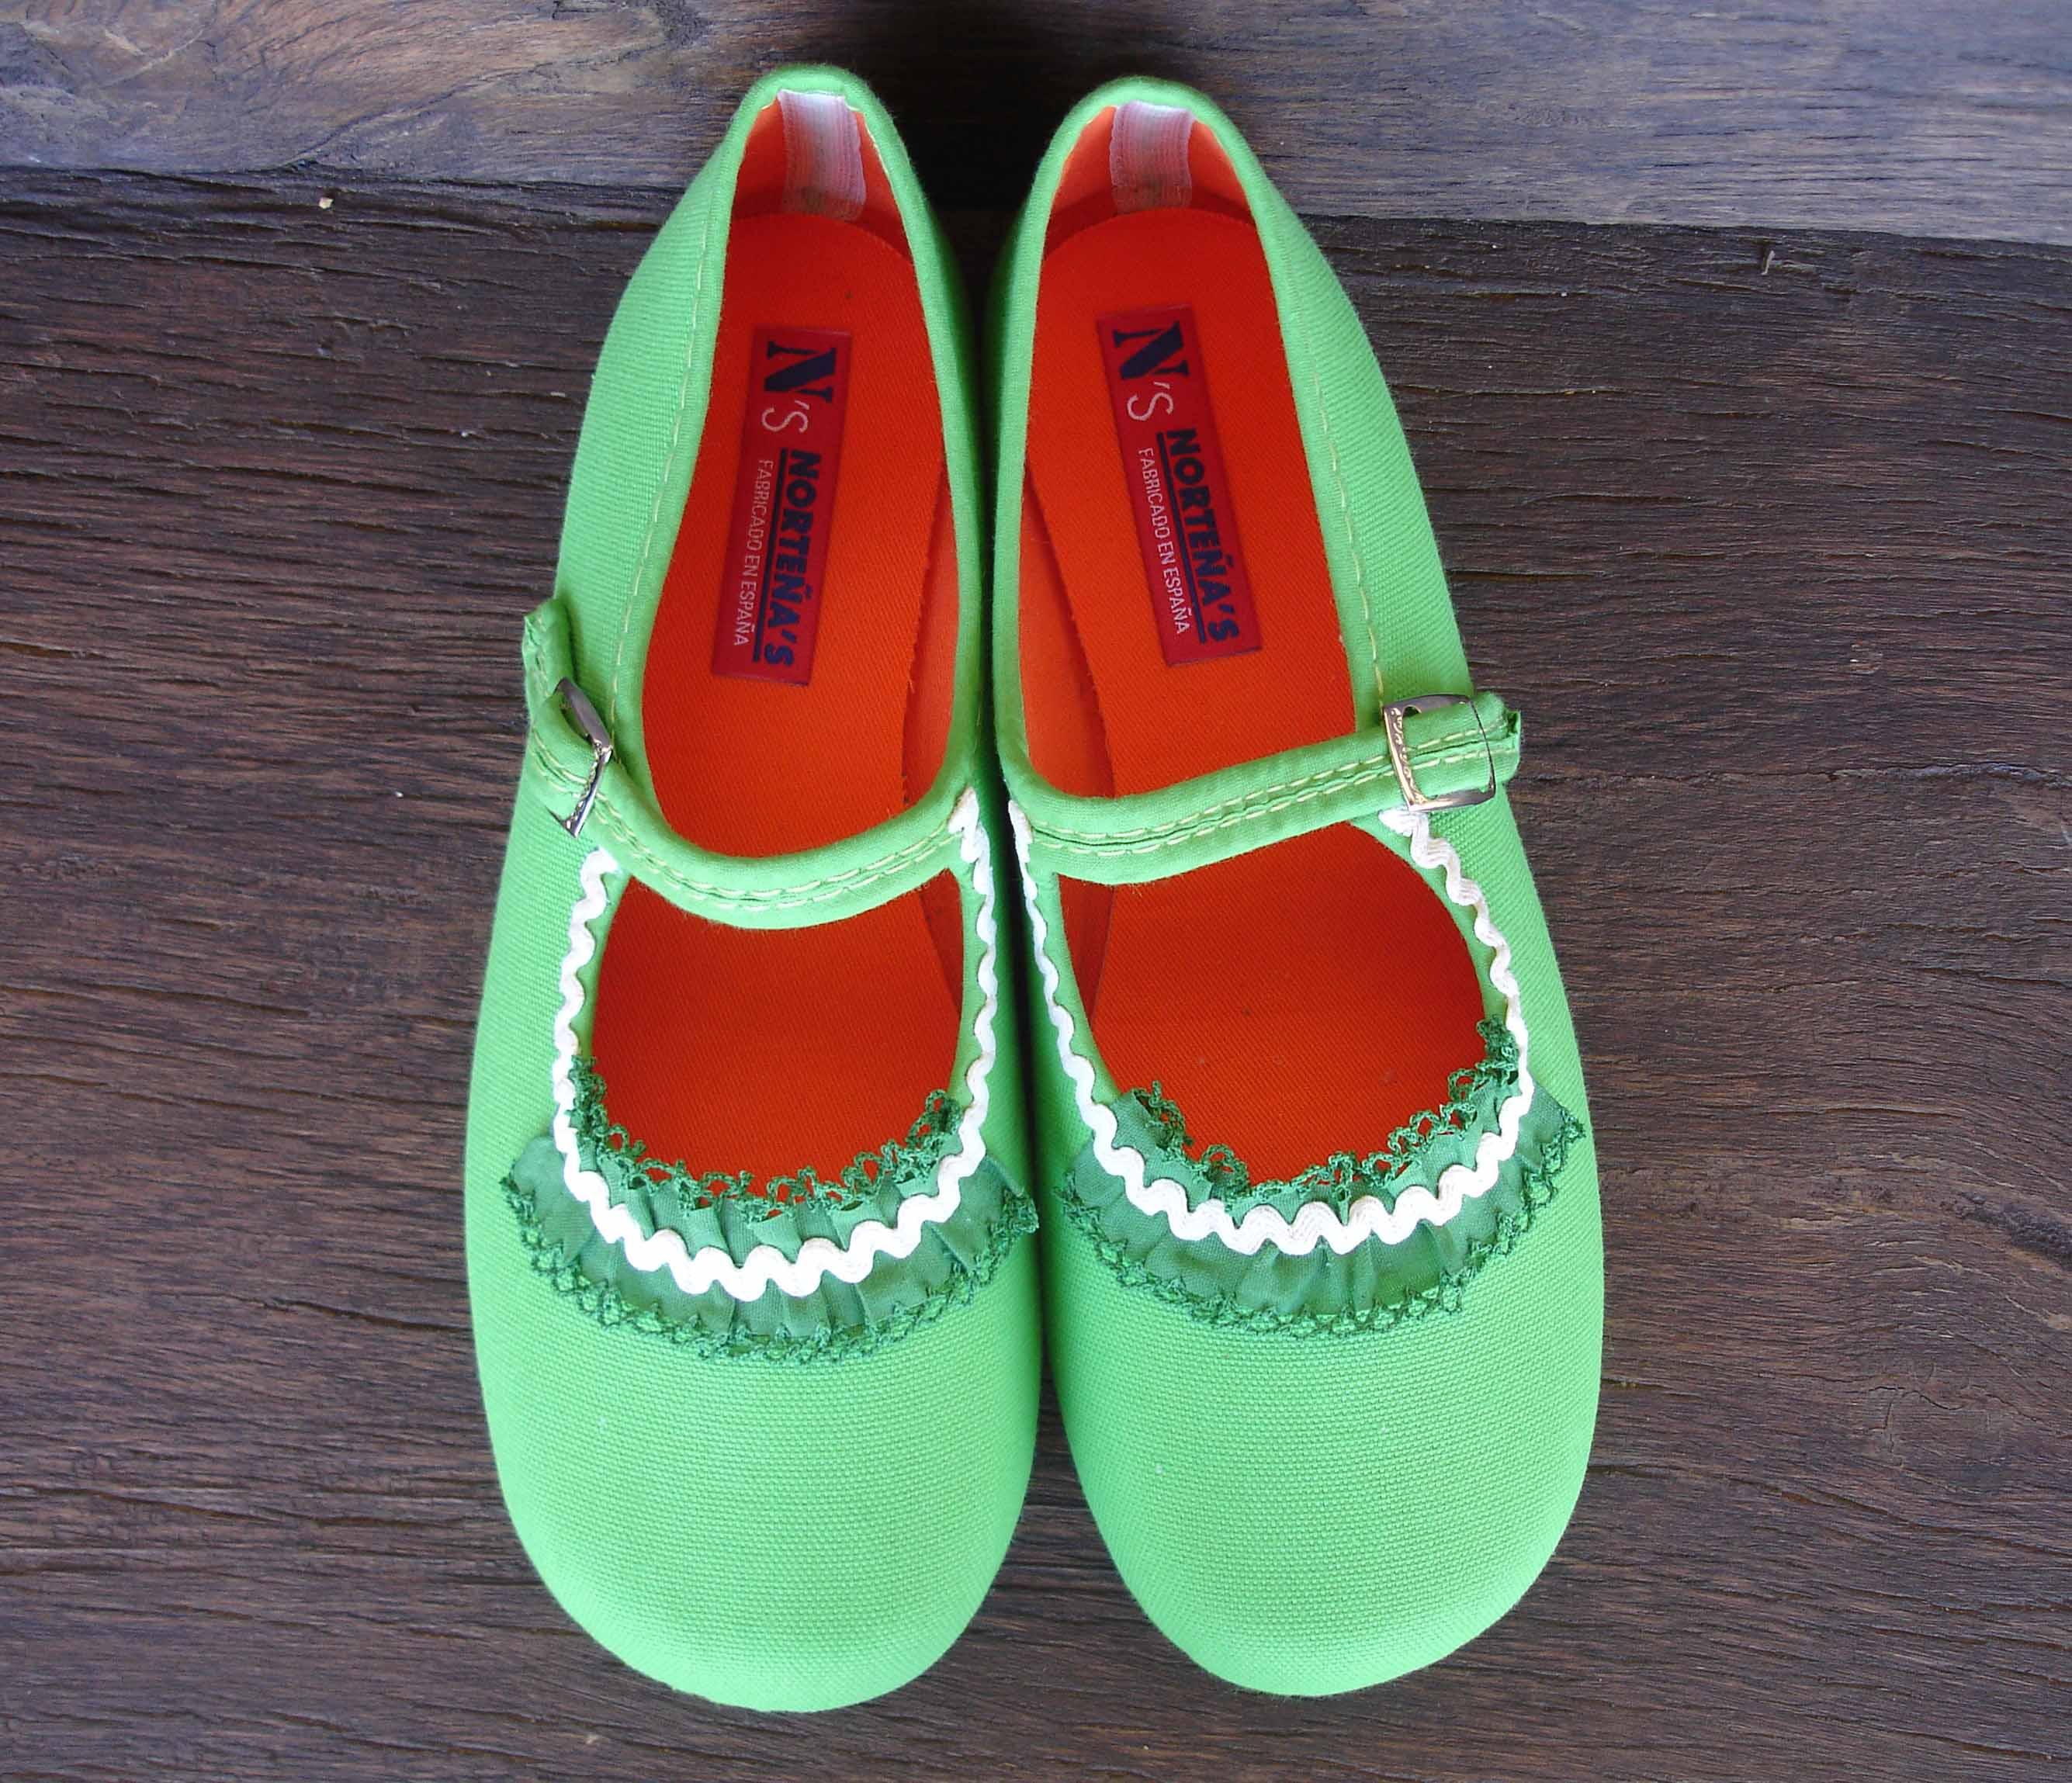 Zapatillas verdes Ana Muñoz